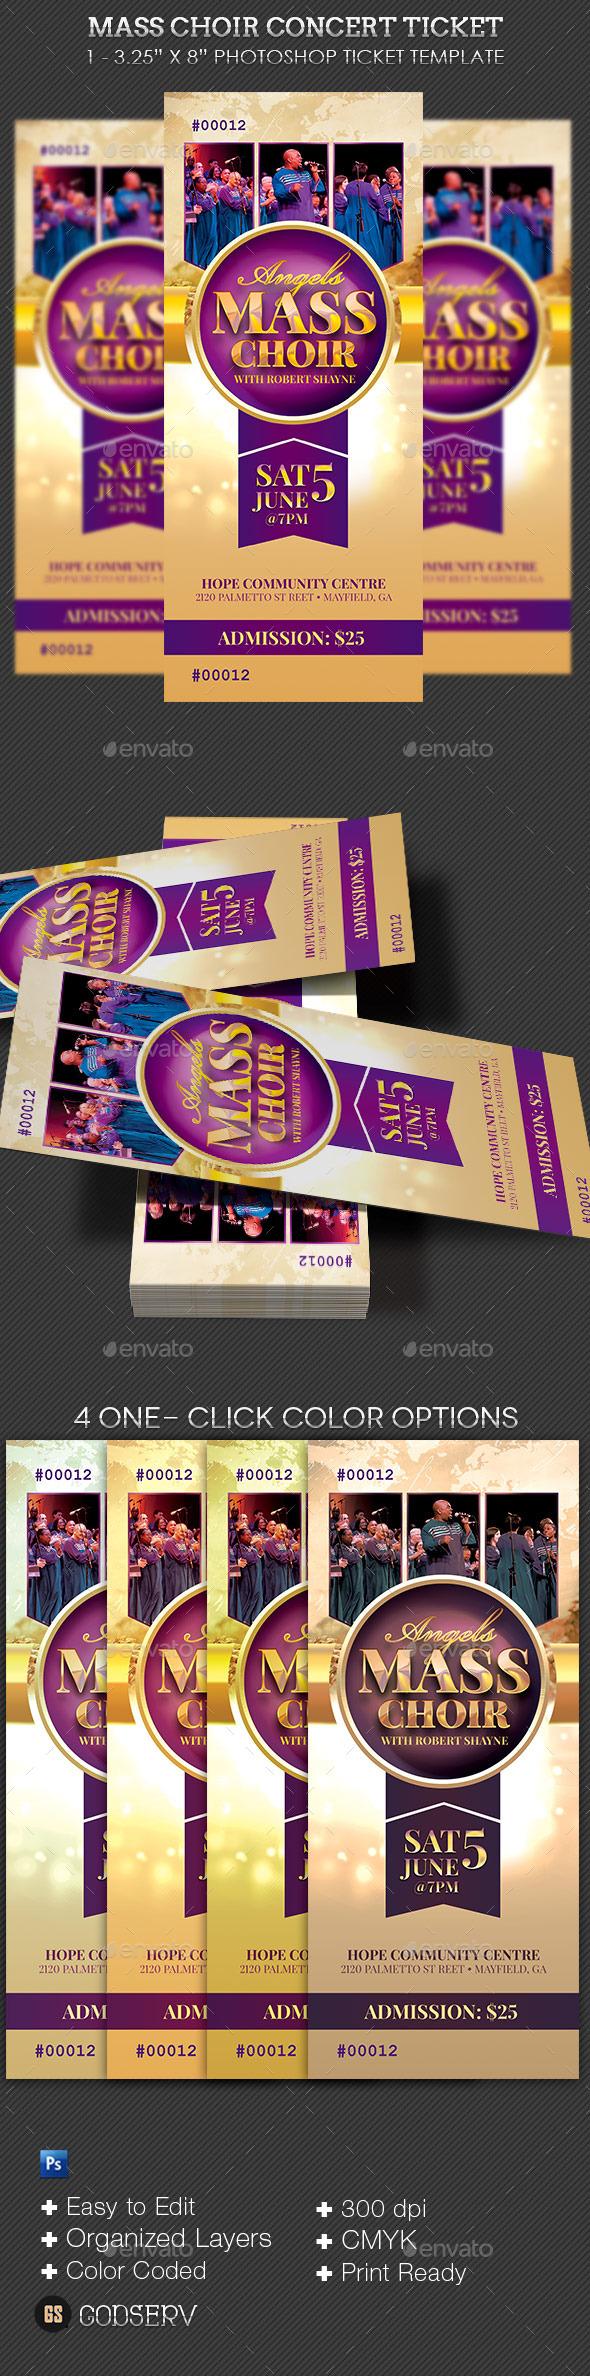 Mass Choir Concert Ticket Template - Cards & Invites Print Templates